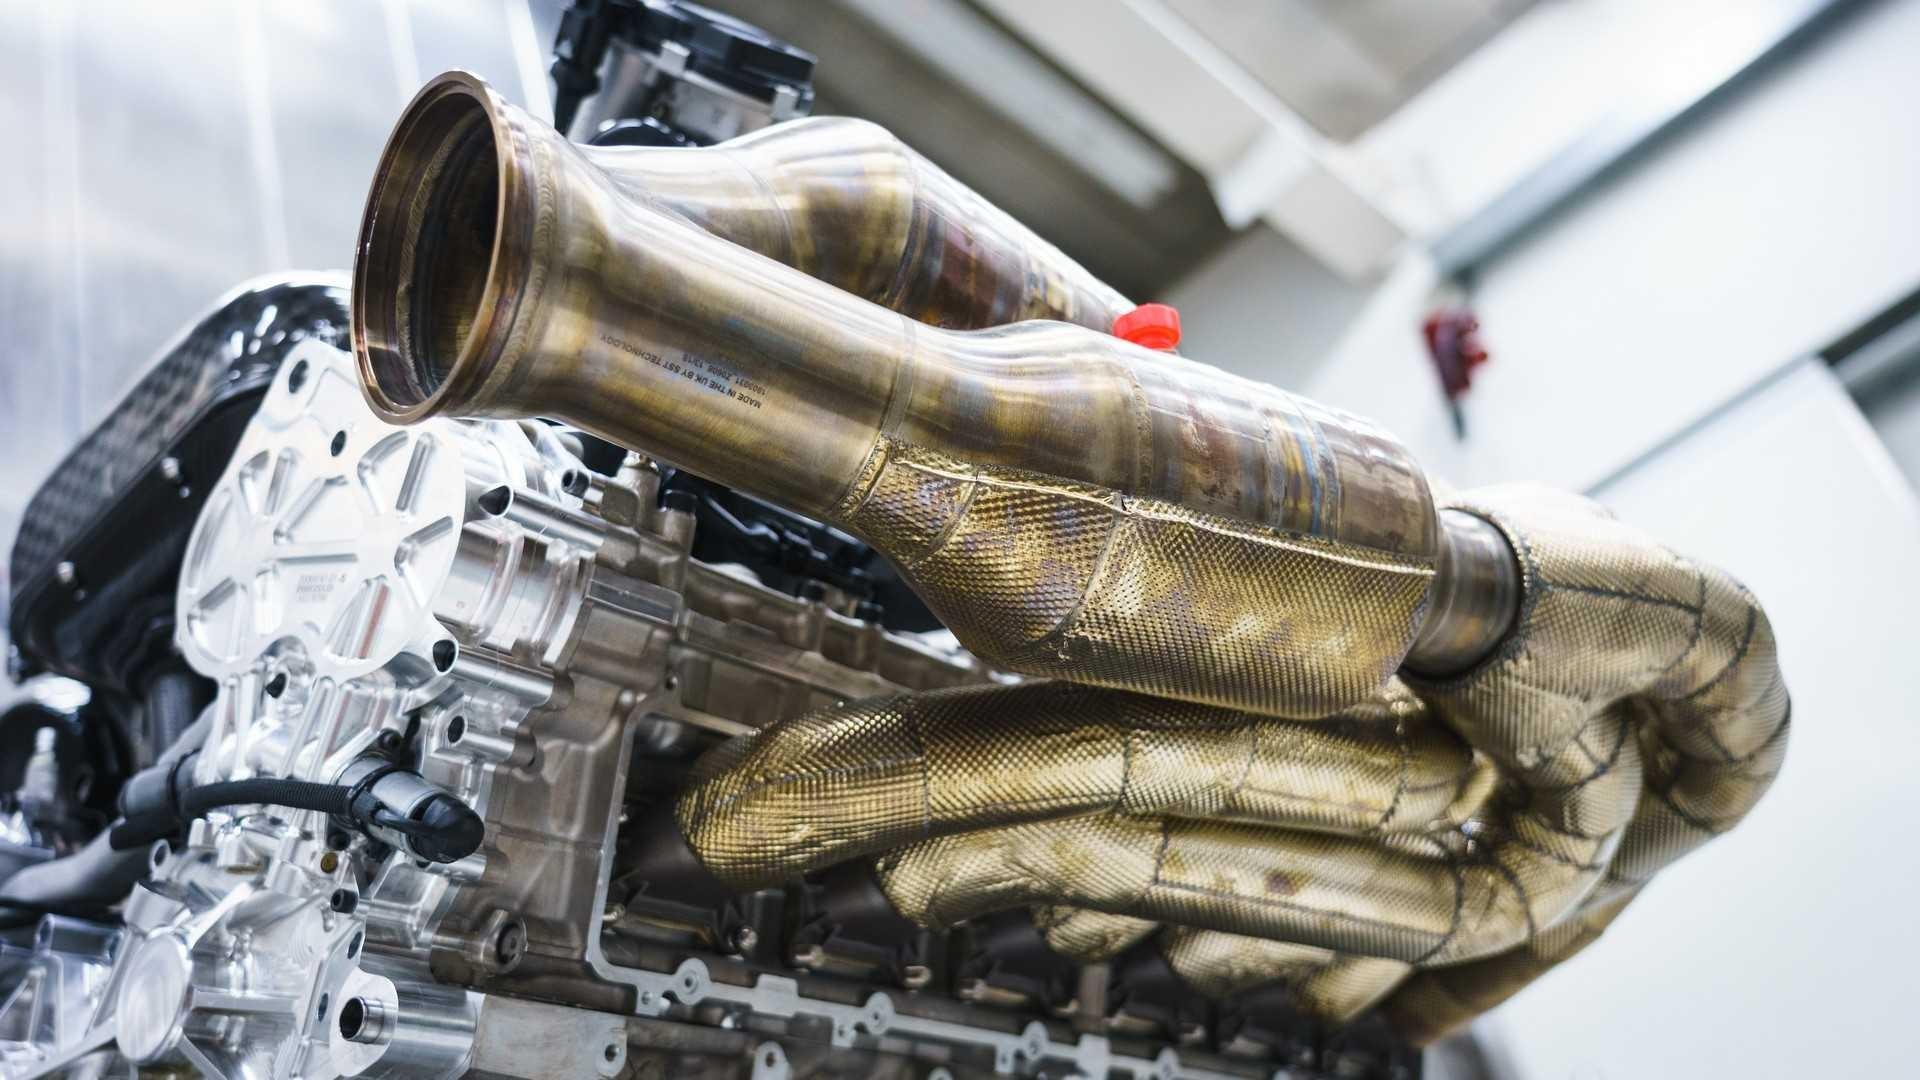 aston-martin-valkyrie-s-cosworth-v12-engine (3)